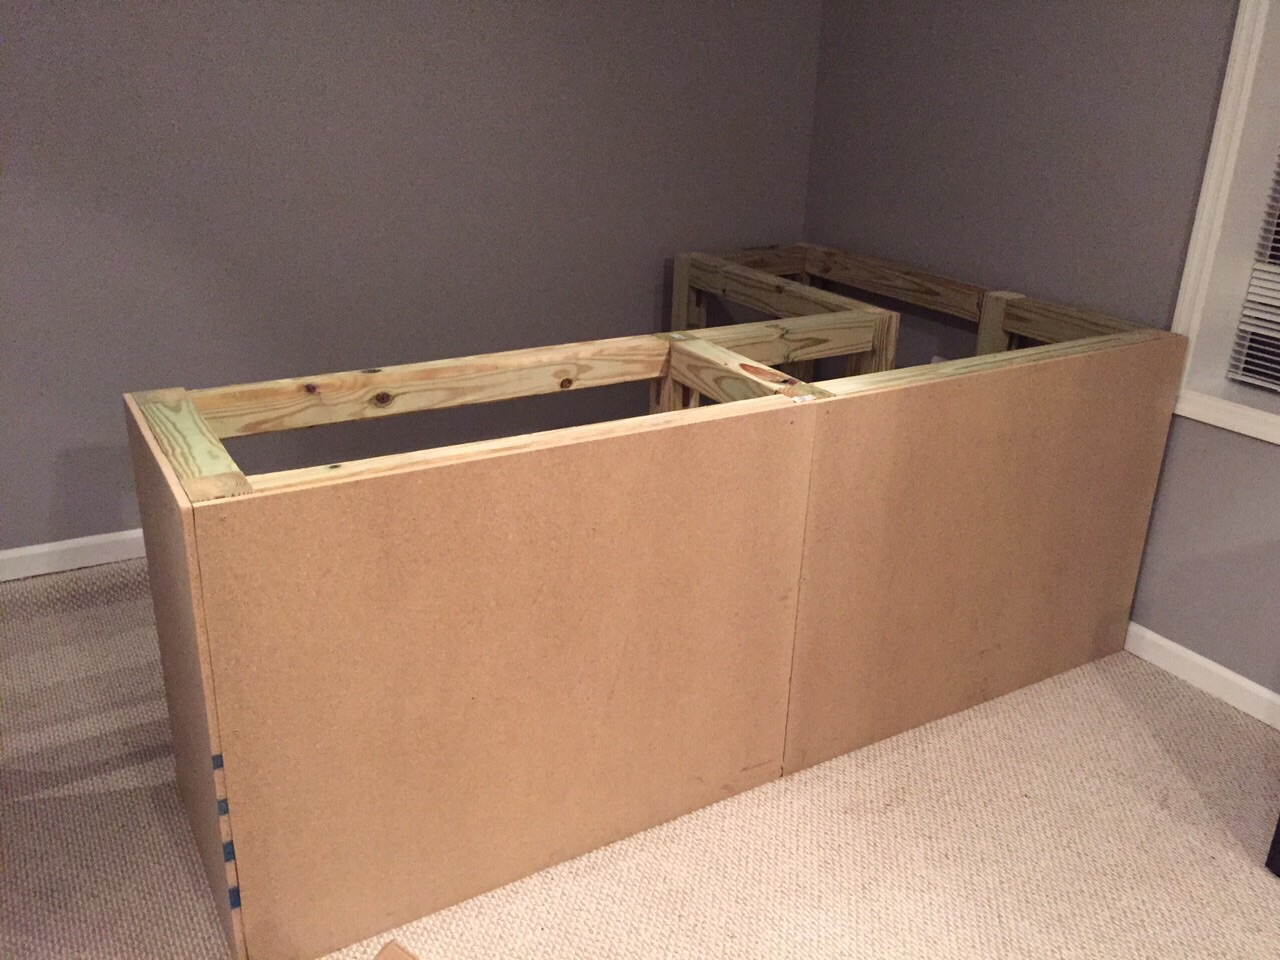 Erste Projekte im neuen Haus | thepruefers